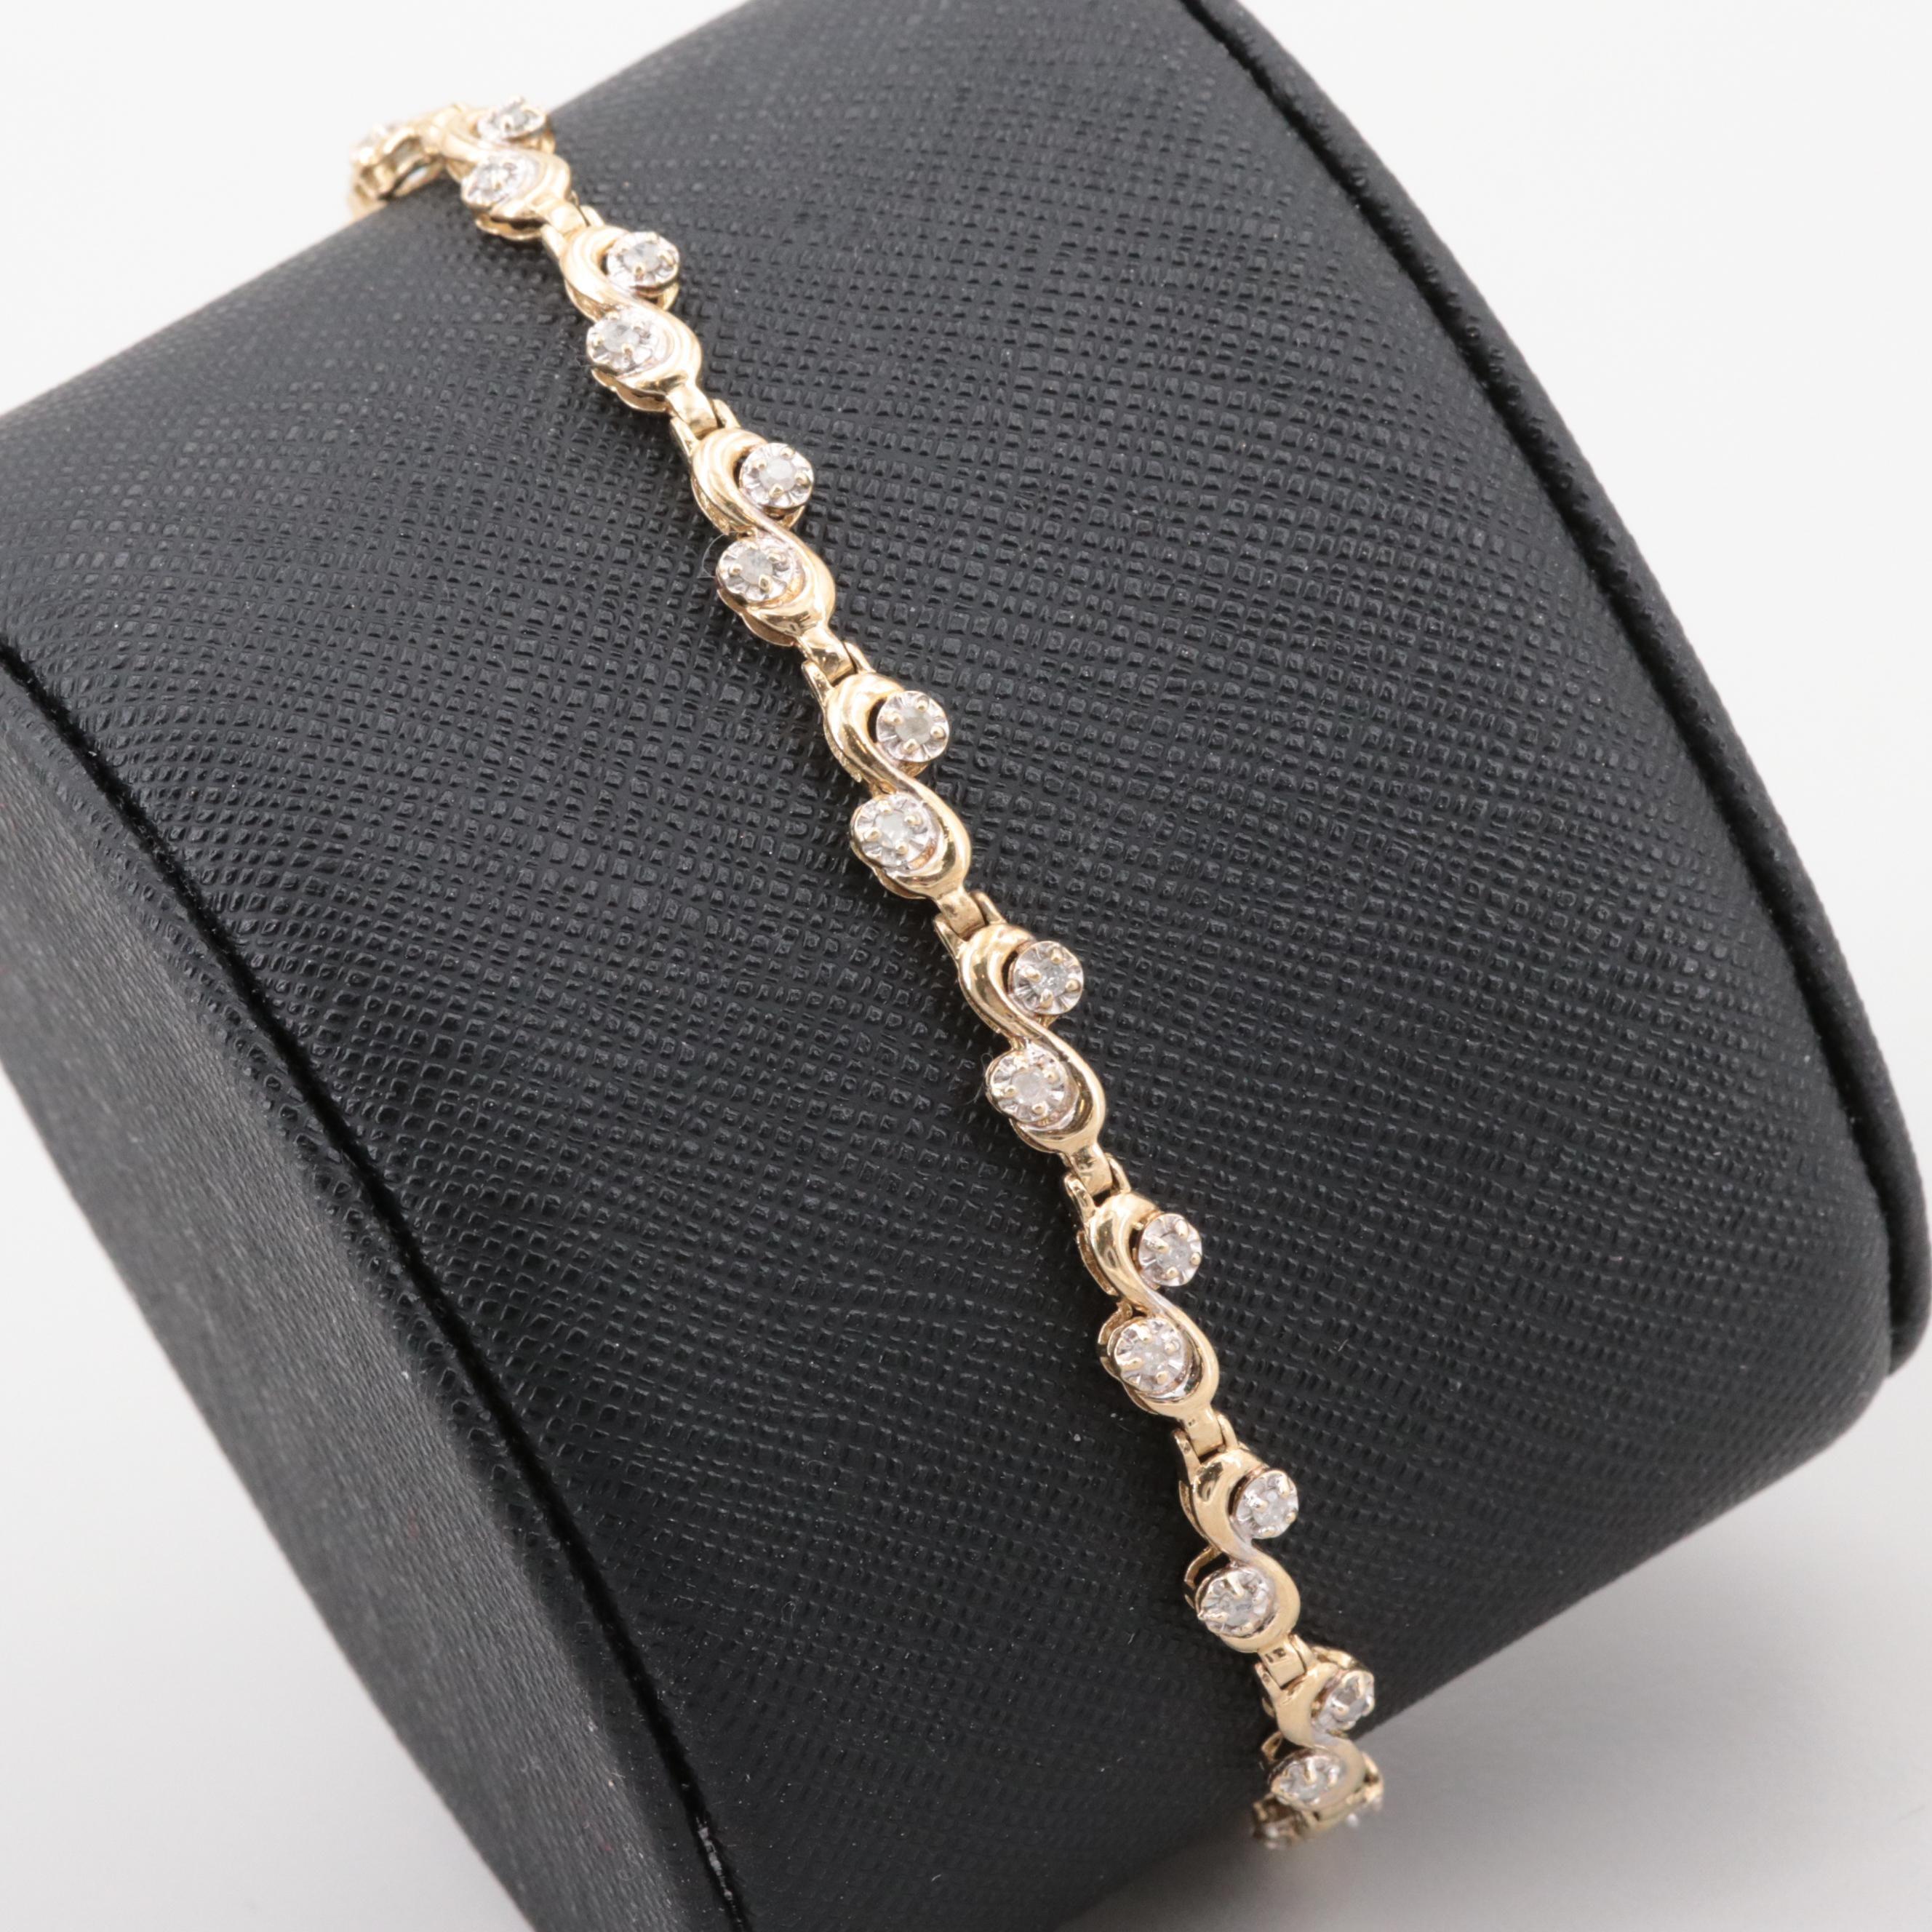 10K Yellow Gold Diamond Tennis Bracelet